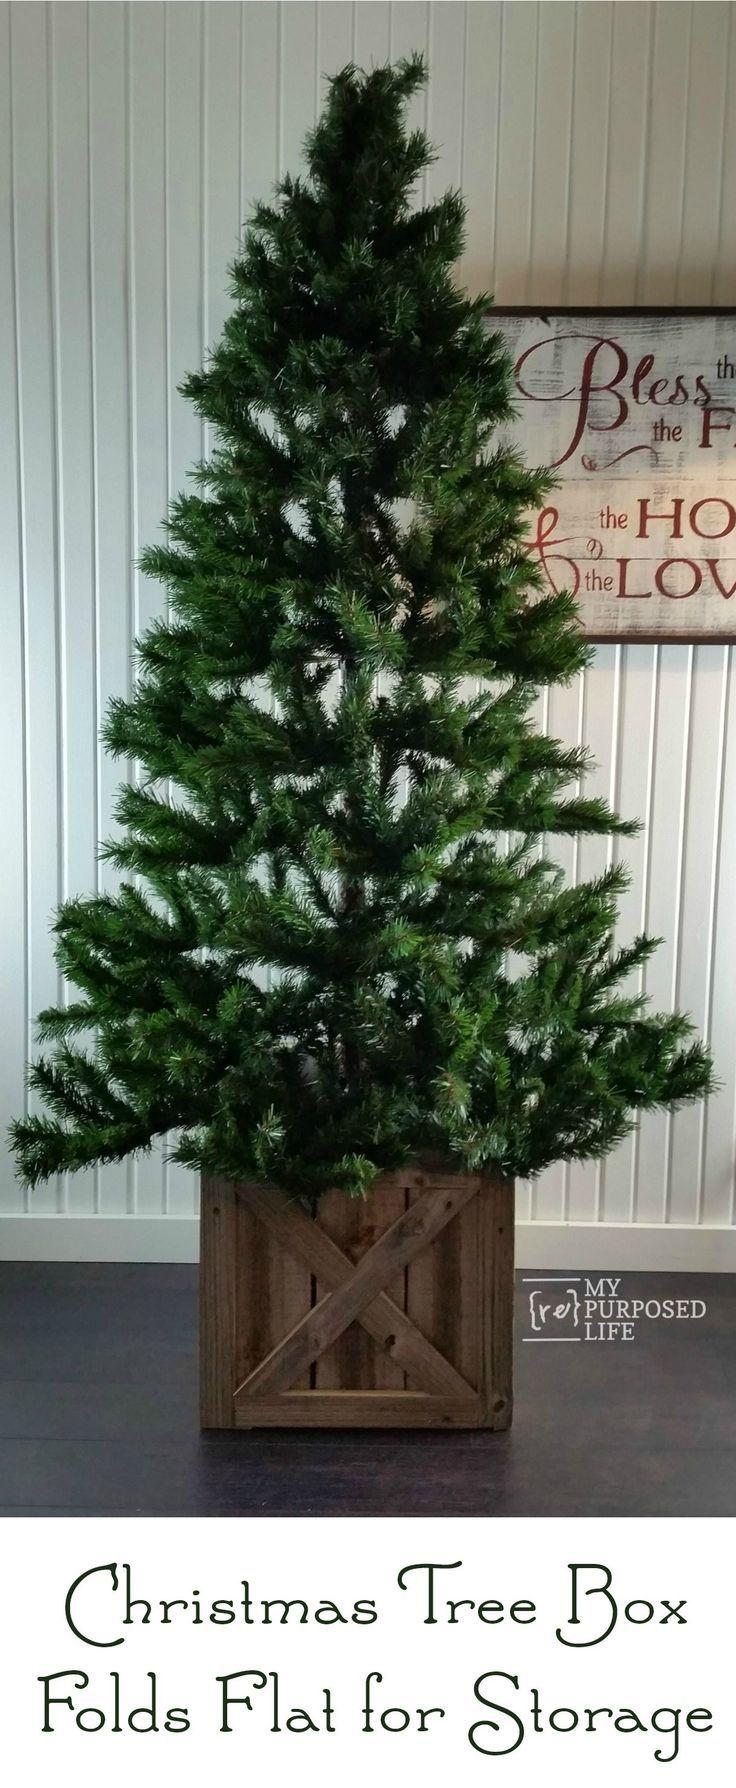 Christmas Tree Stand Box Folds Flat For Storage Myrepurposedlife Com Artificial Christmas Tre Christmas Tree Stand Diy Diy Christmas Tree Christmas Tree Box